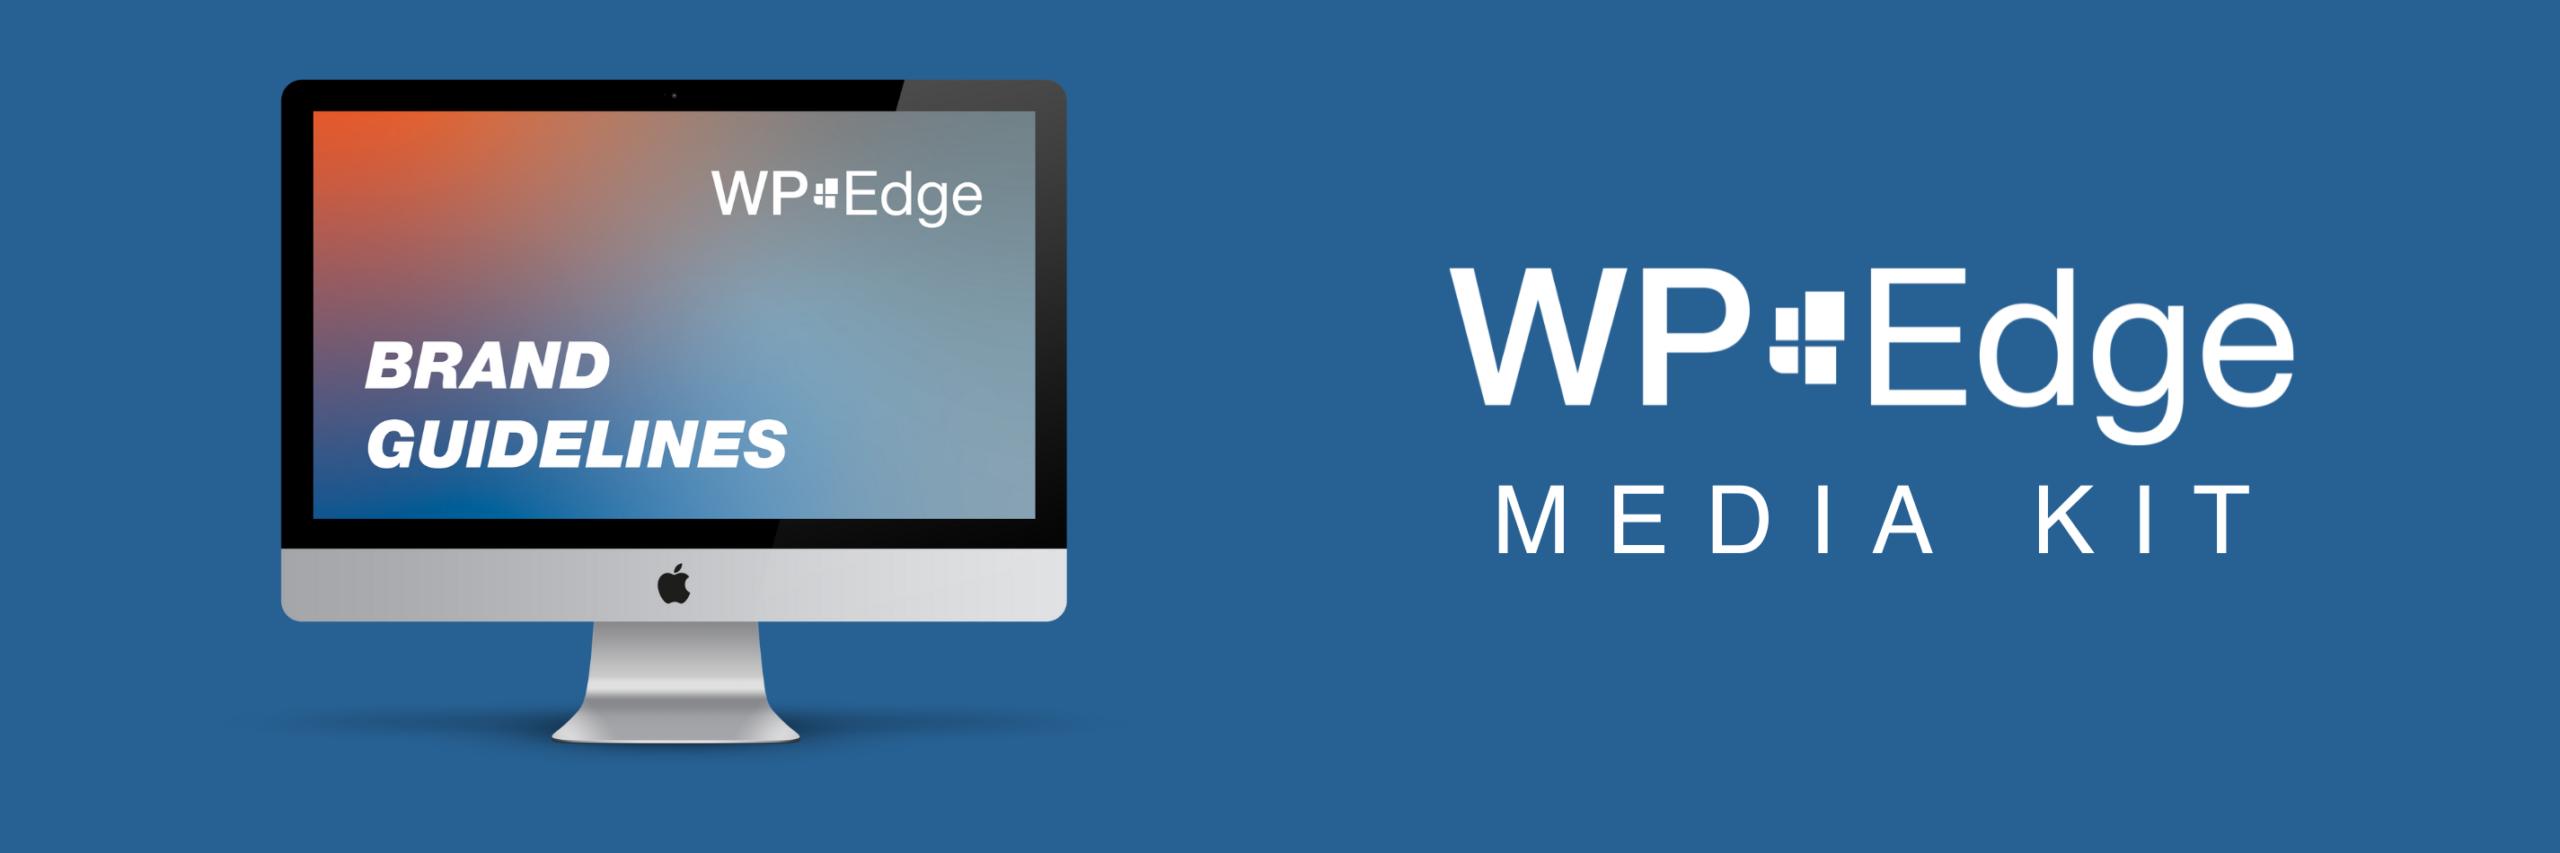 WP Edge Media Kit